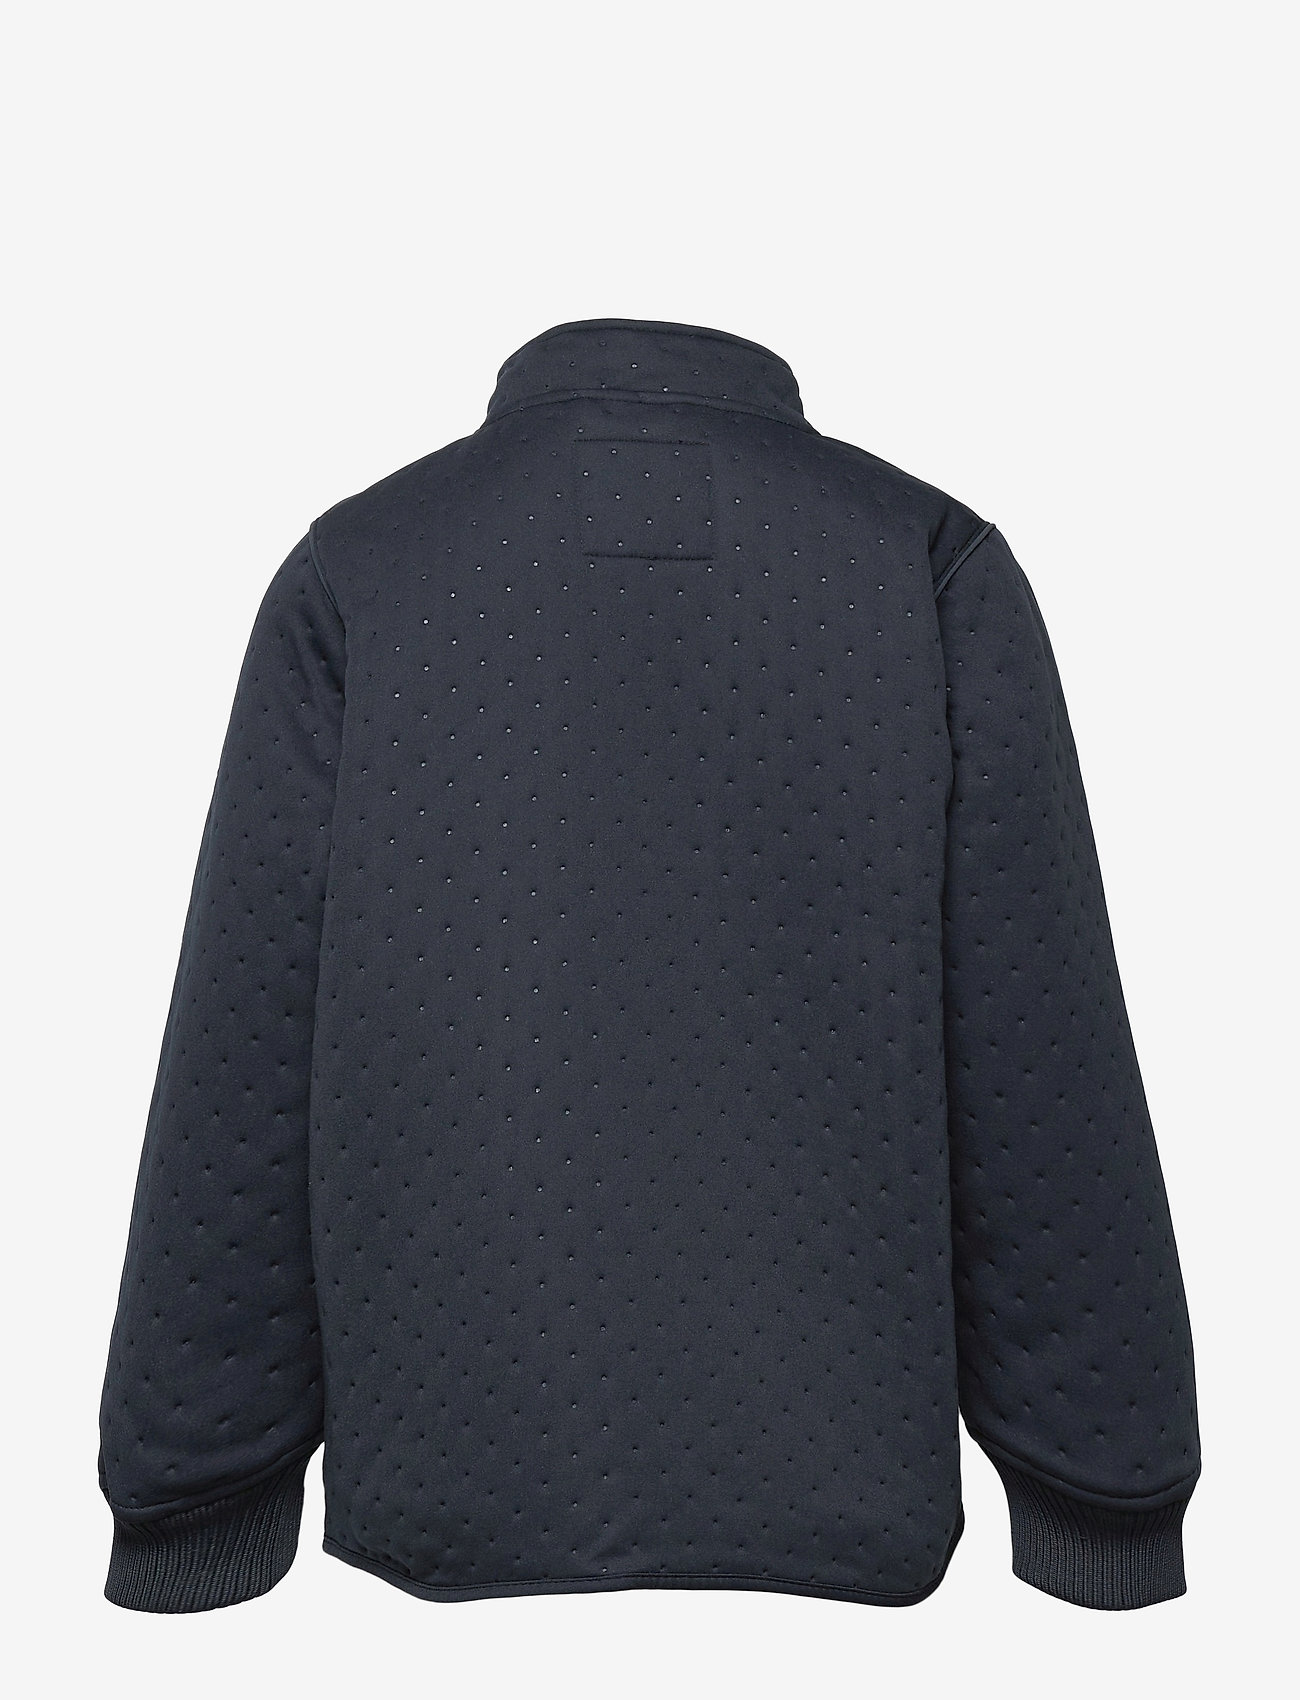 Mikk-Line - Soft Thermo Recycled Boy Jacket - termojakke - blue nights - 1